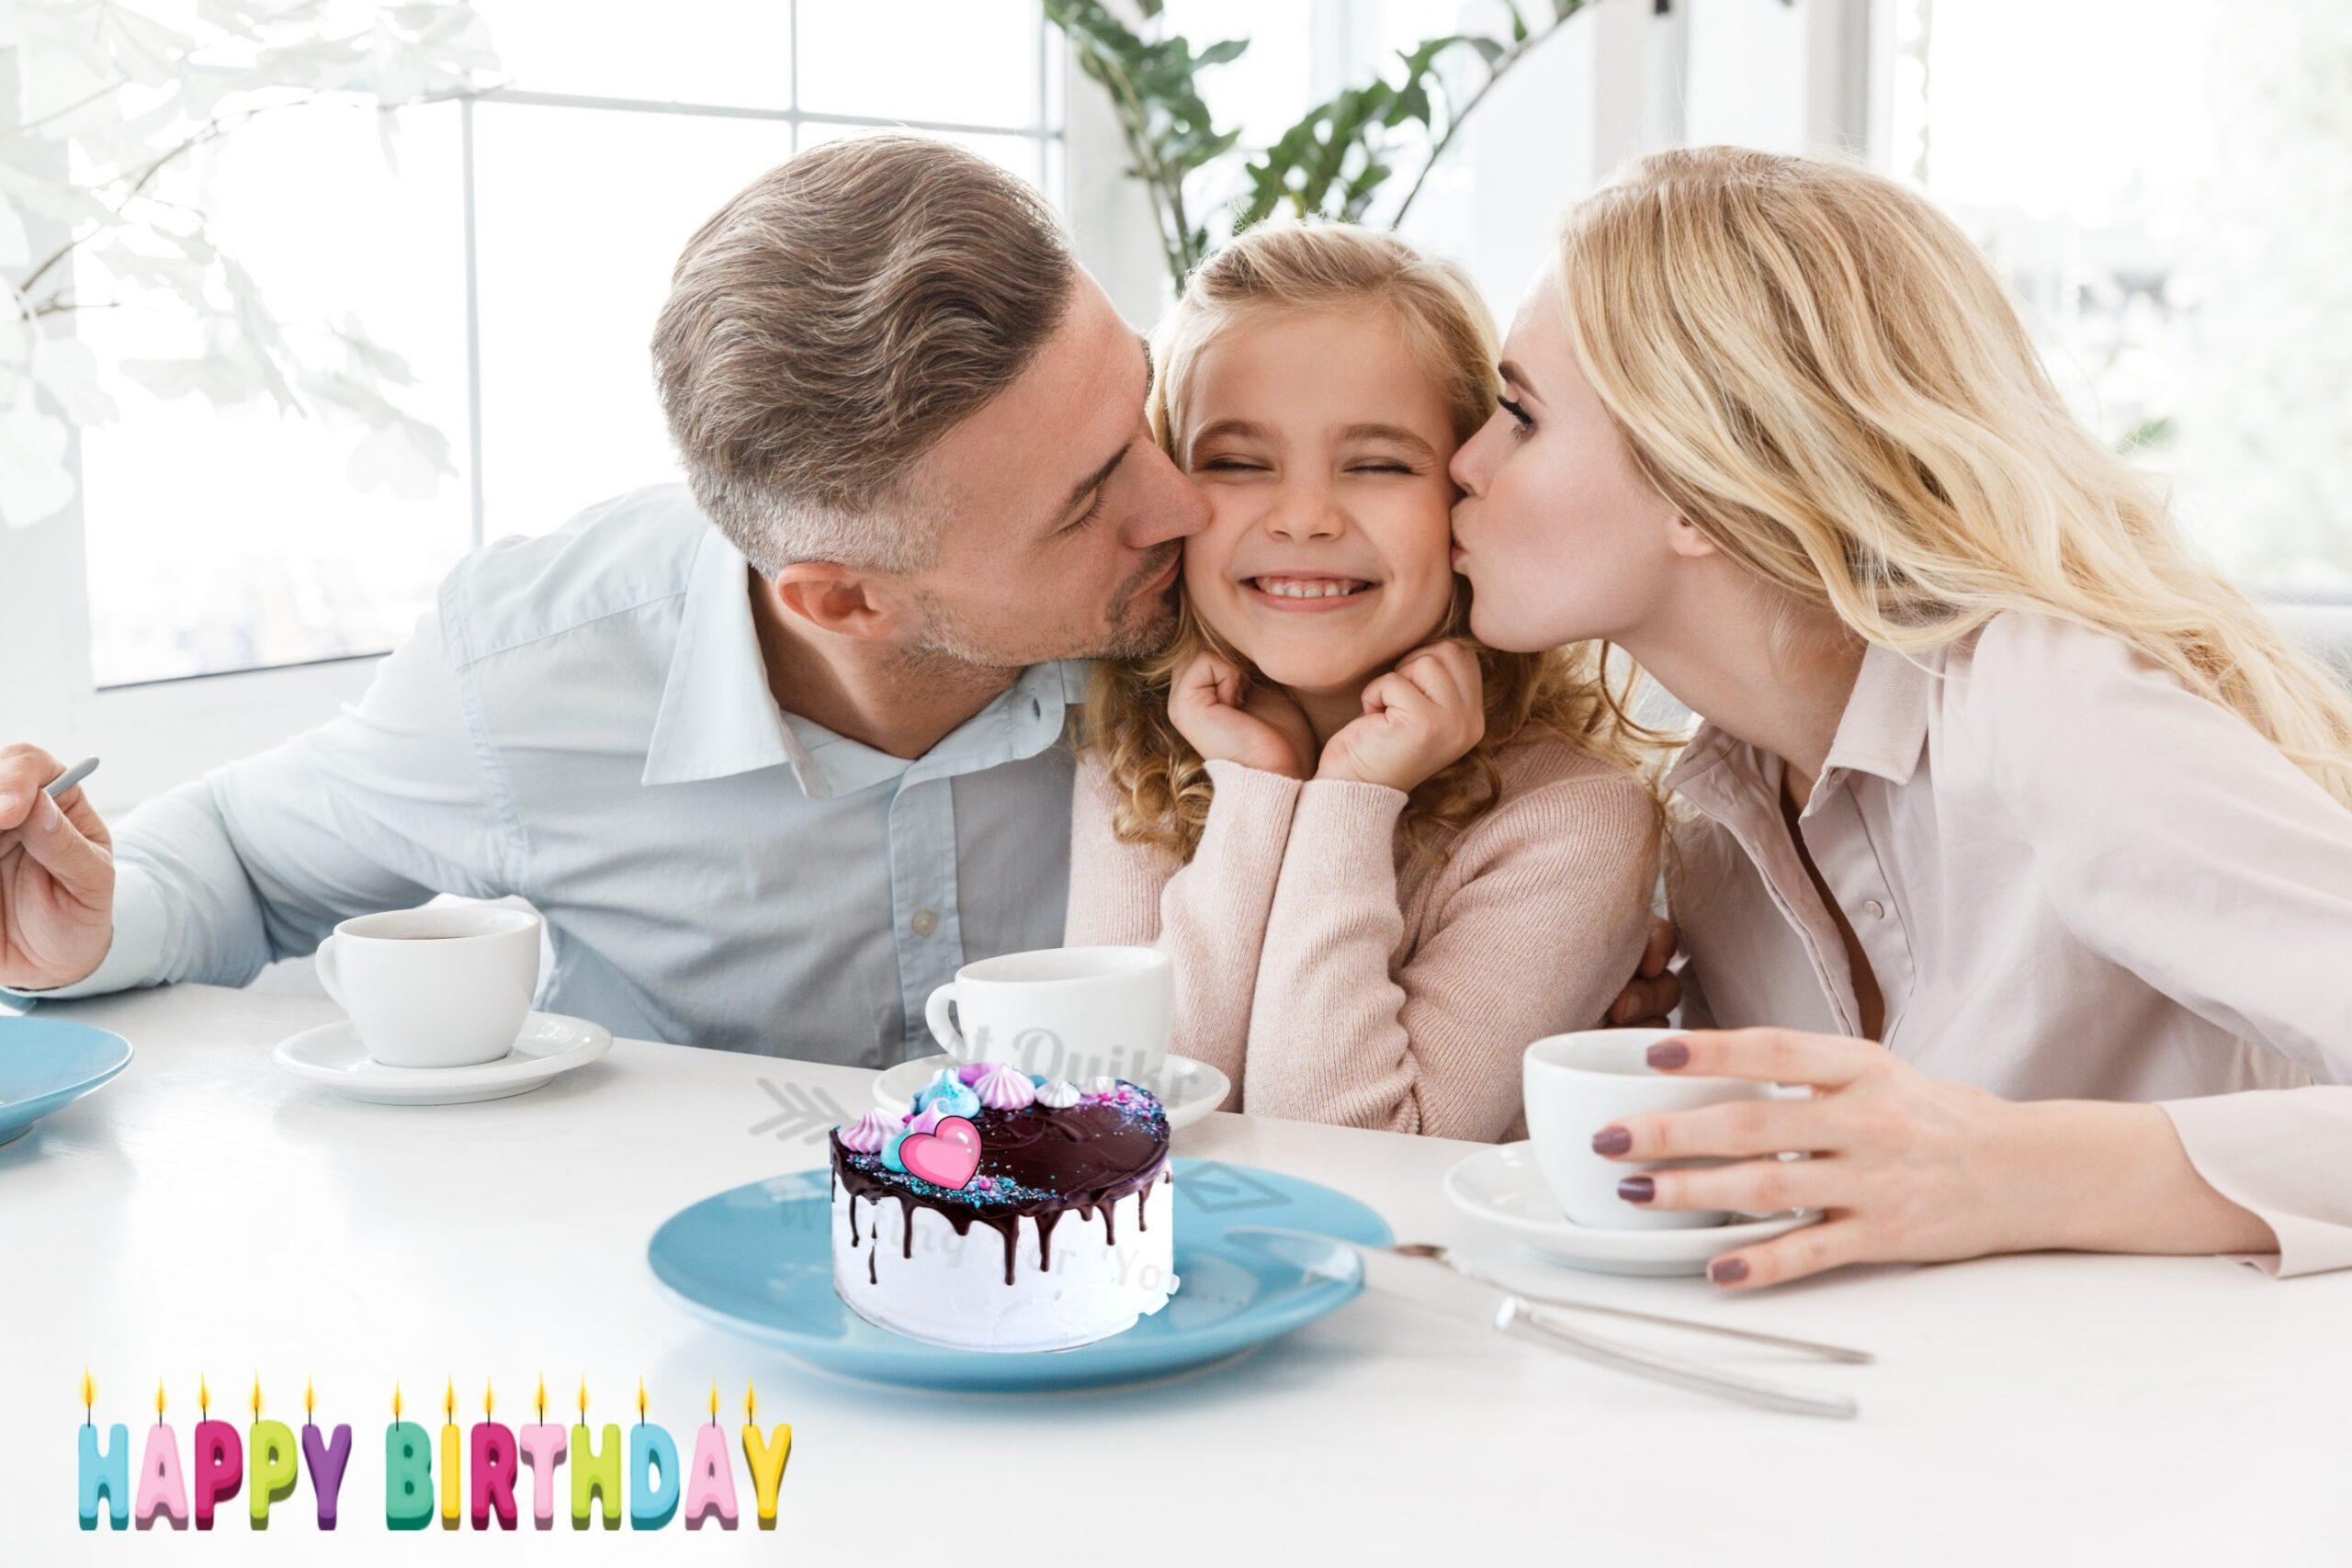 Creative Happy Birthday Wishing Cake Status Images for Girl Child